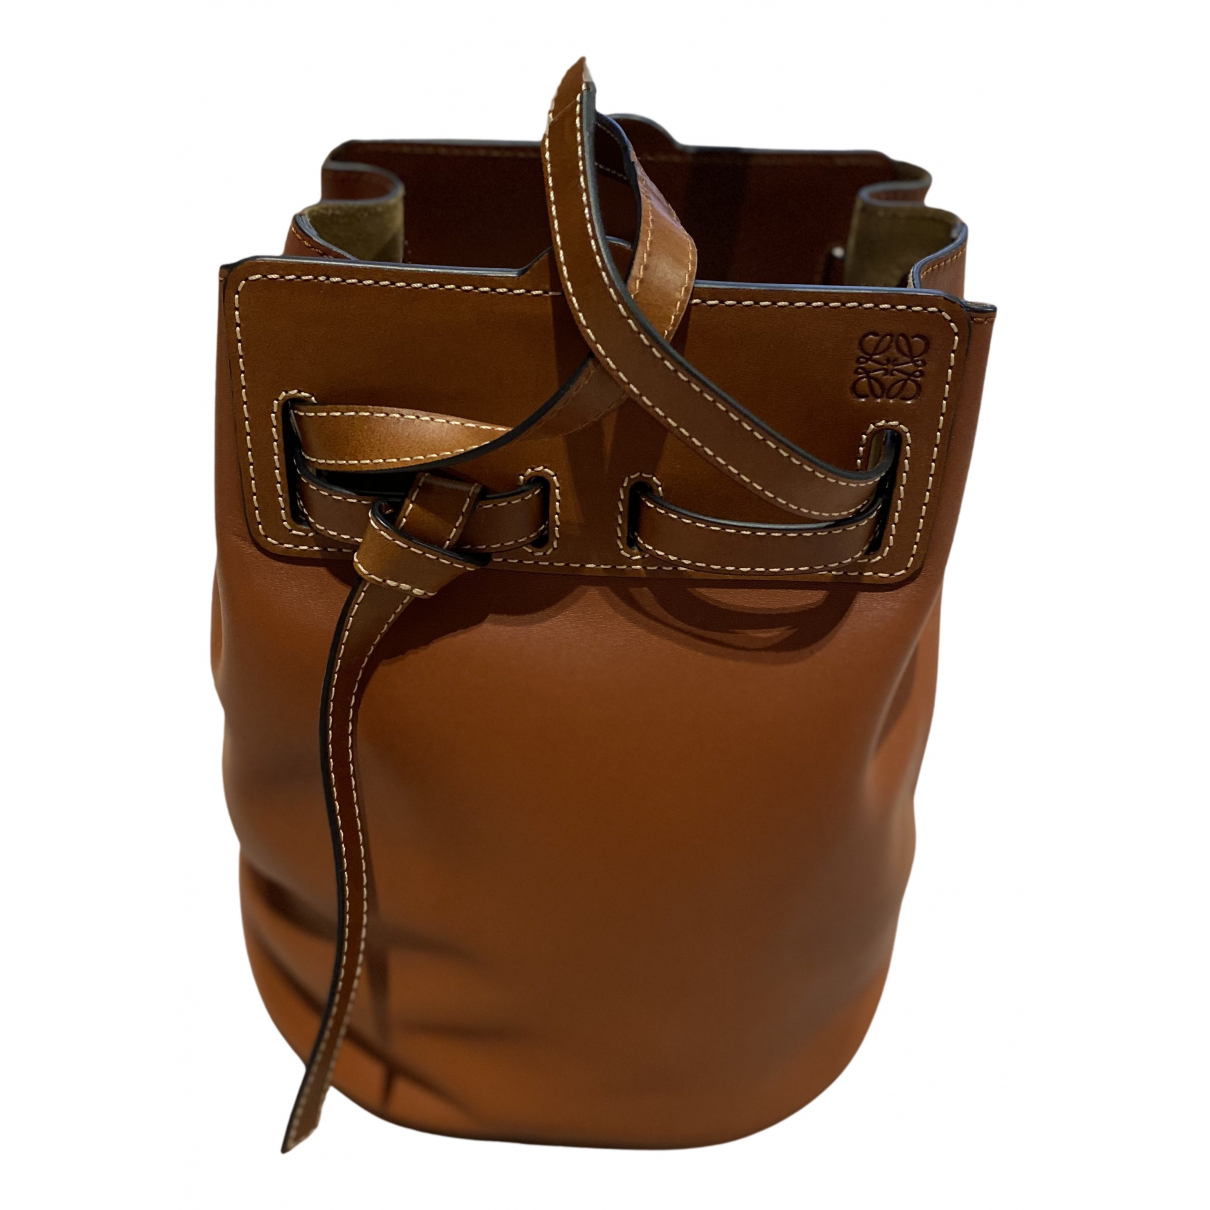 Loewe Ruk Bucket Camel Leather handbag for Women N